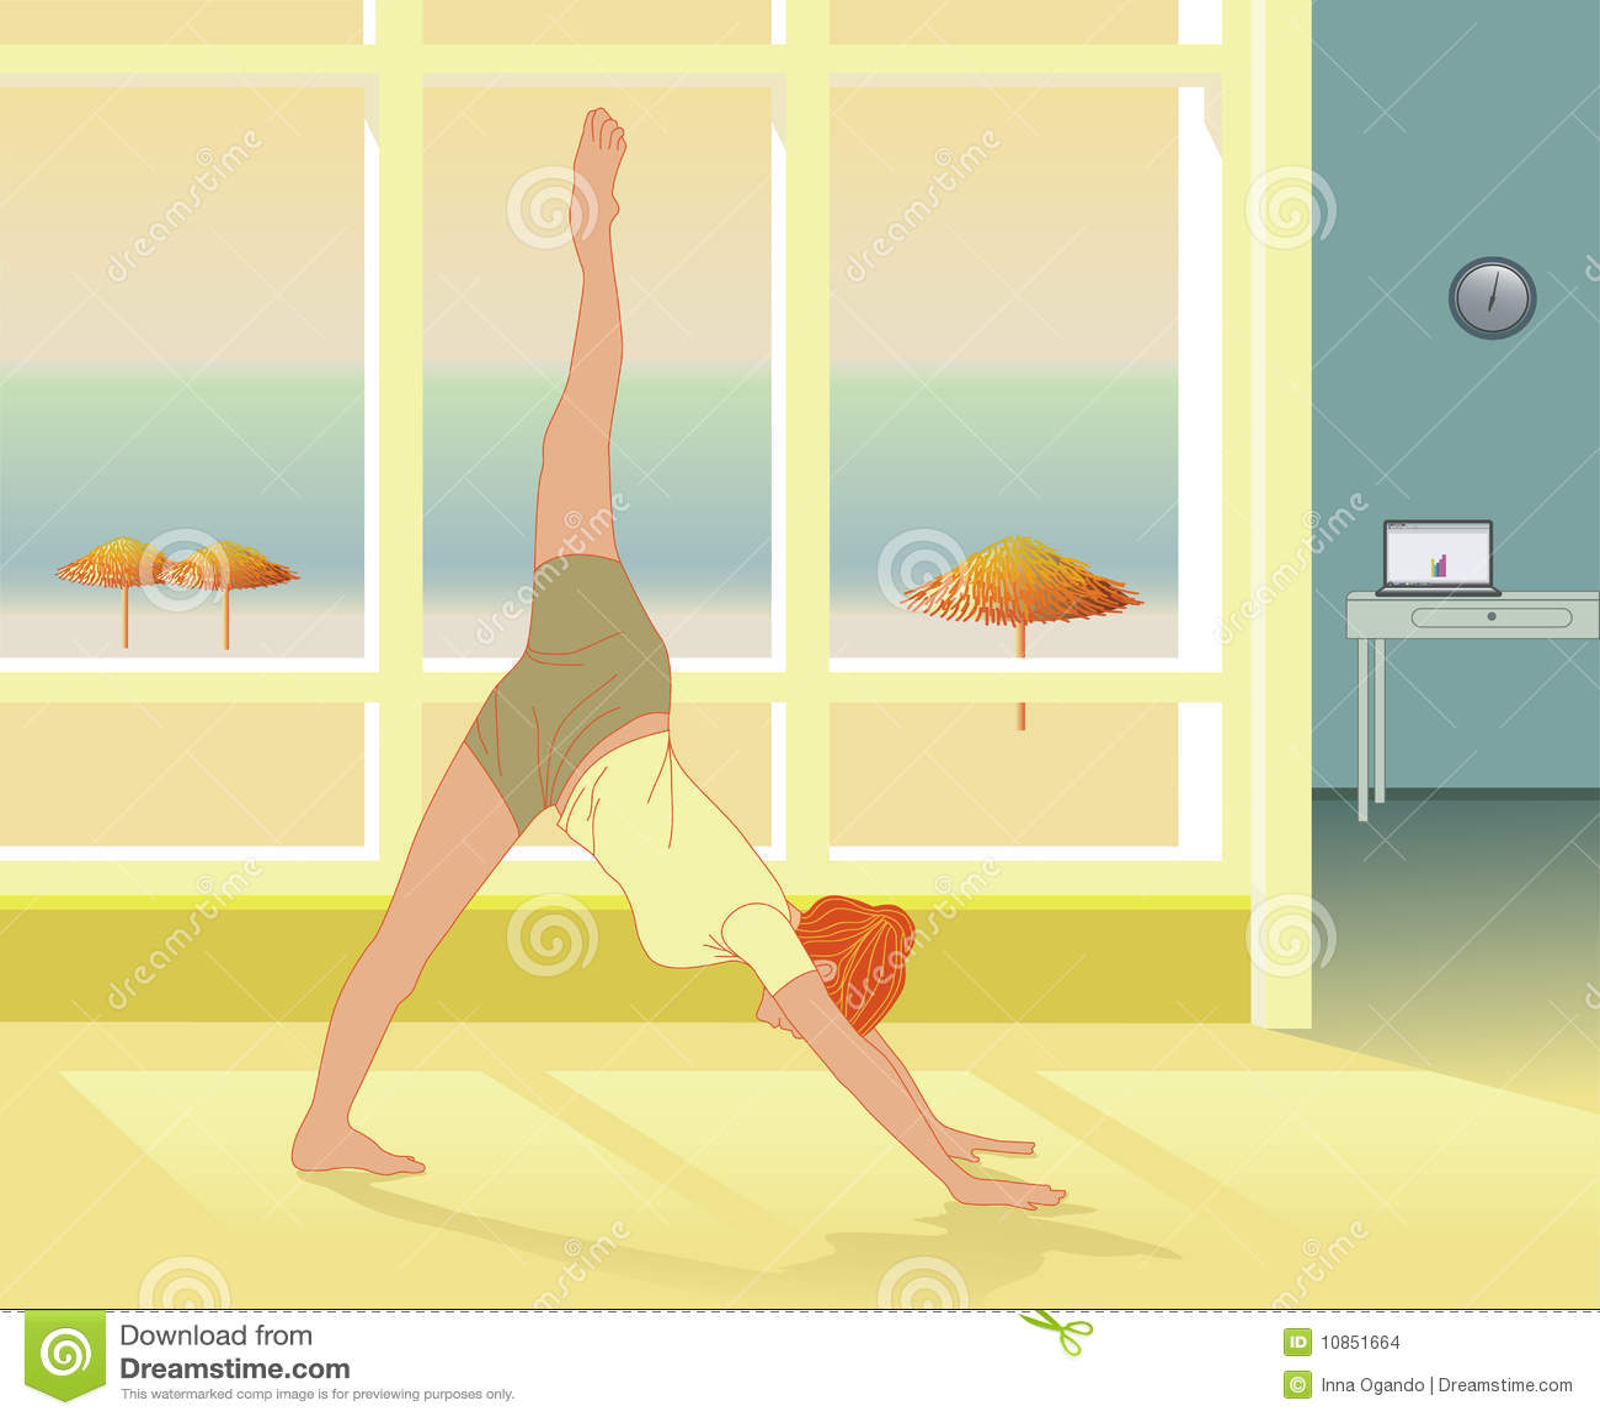 Yoga practice and reiki self healing